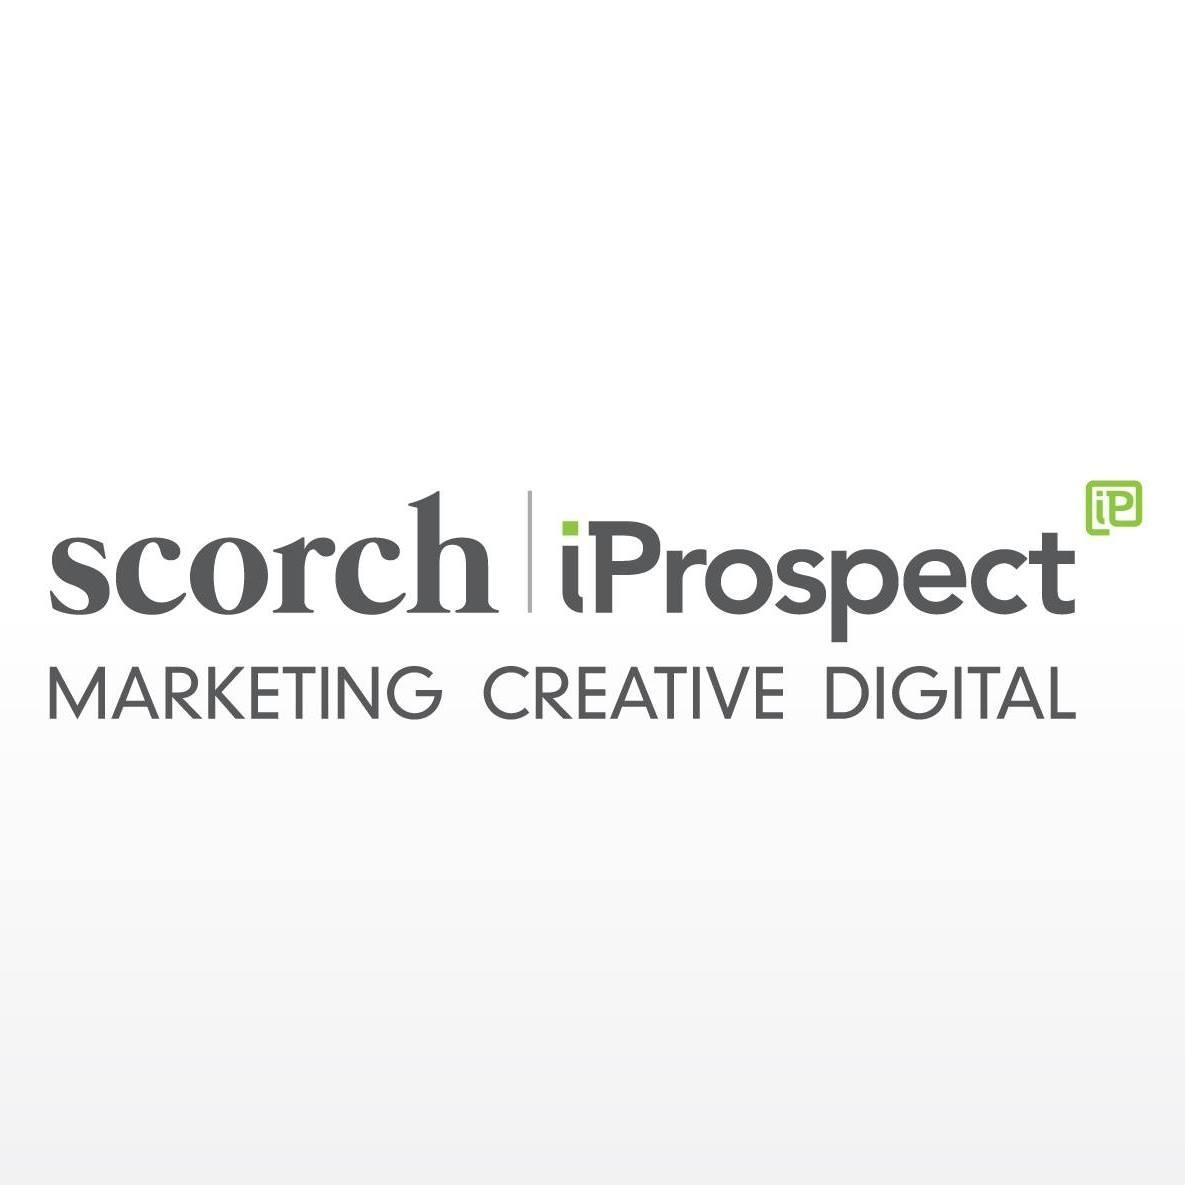 Scorch iProspect